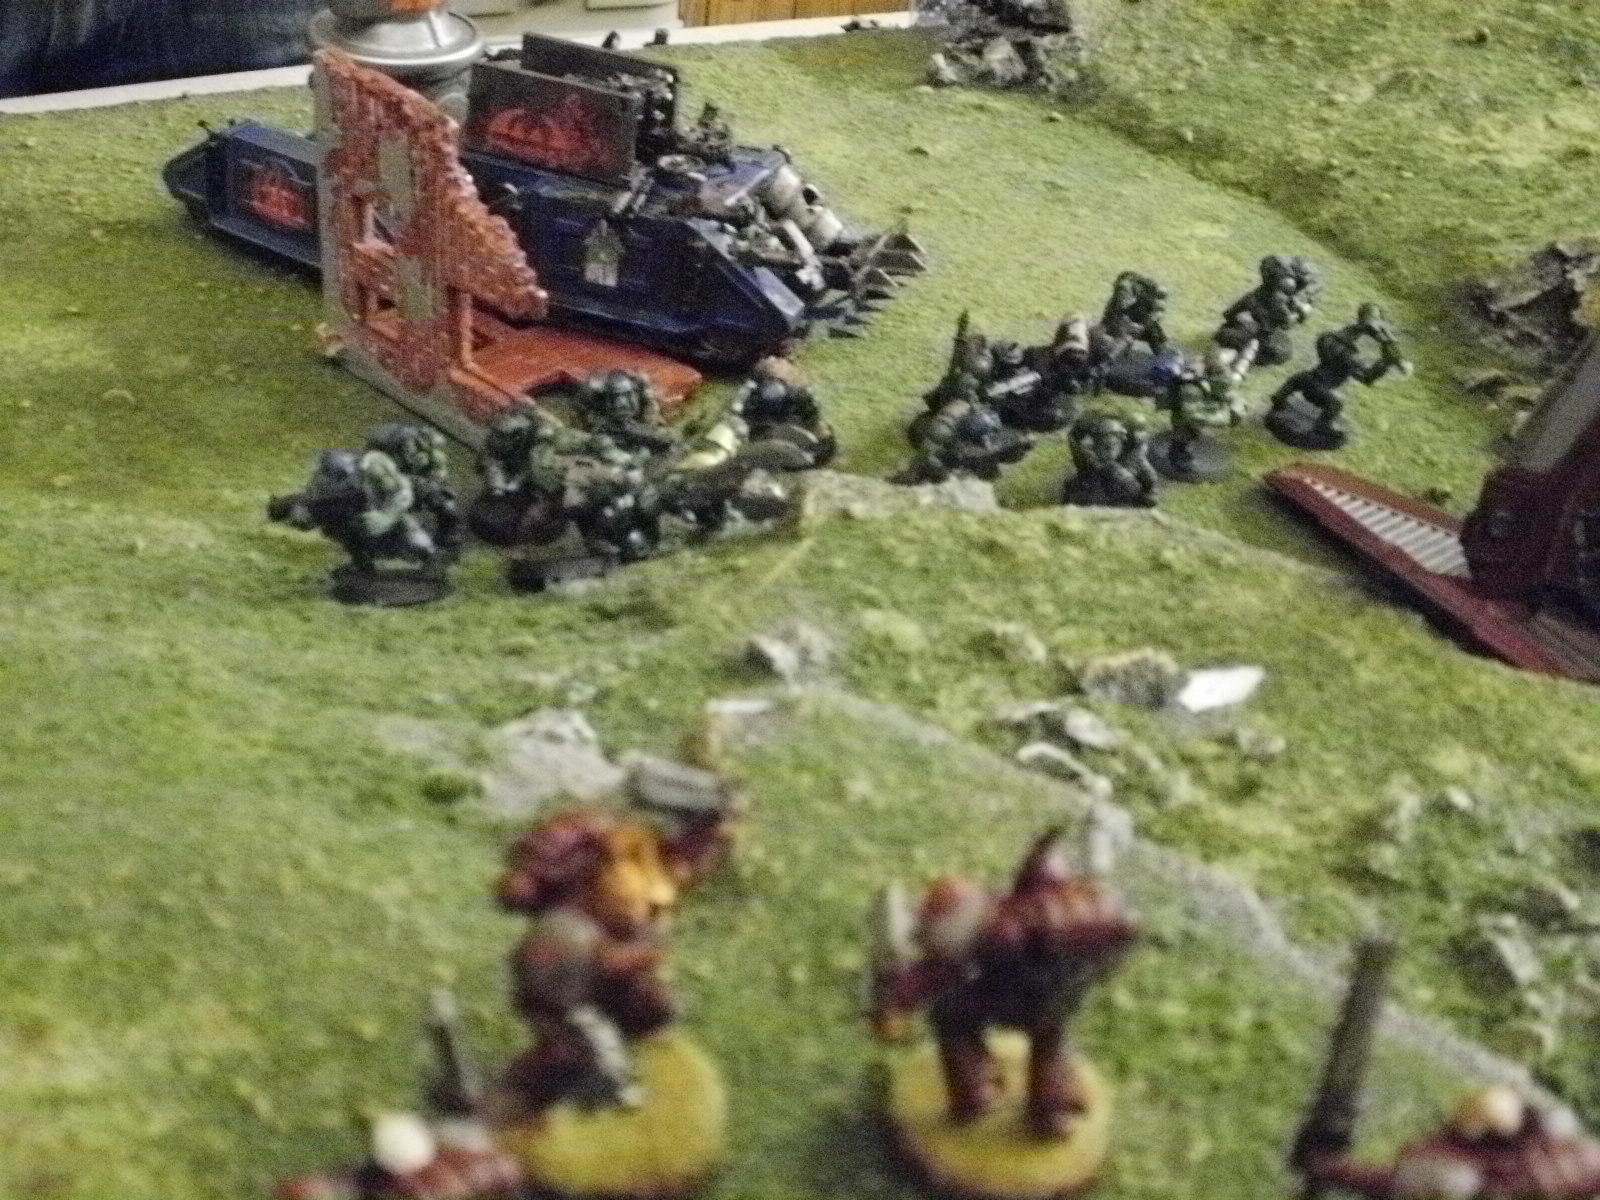 Battle, Dynamic, Orks, Space Marines